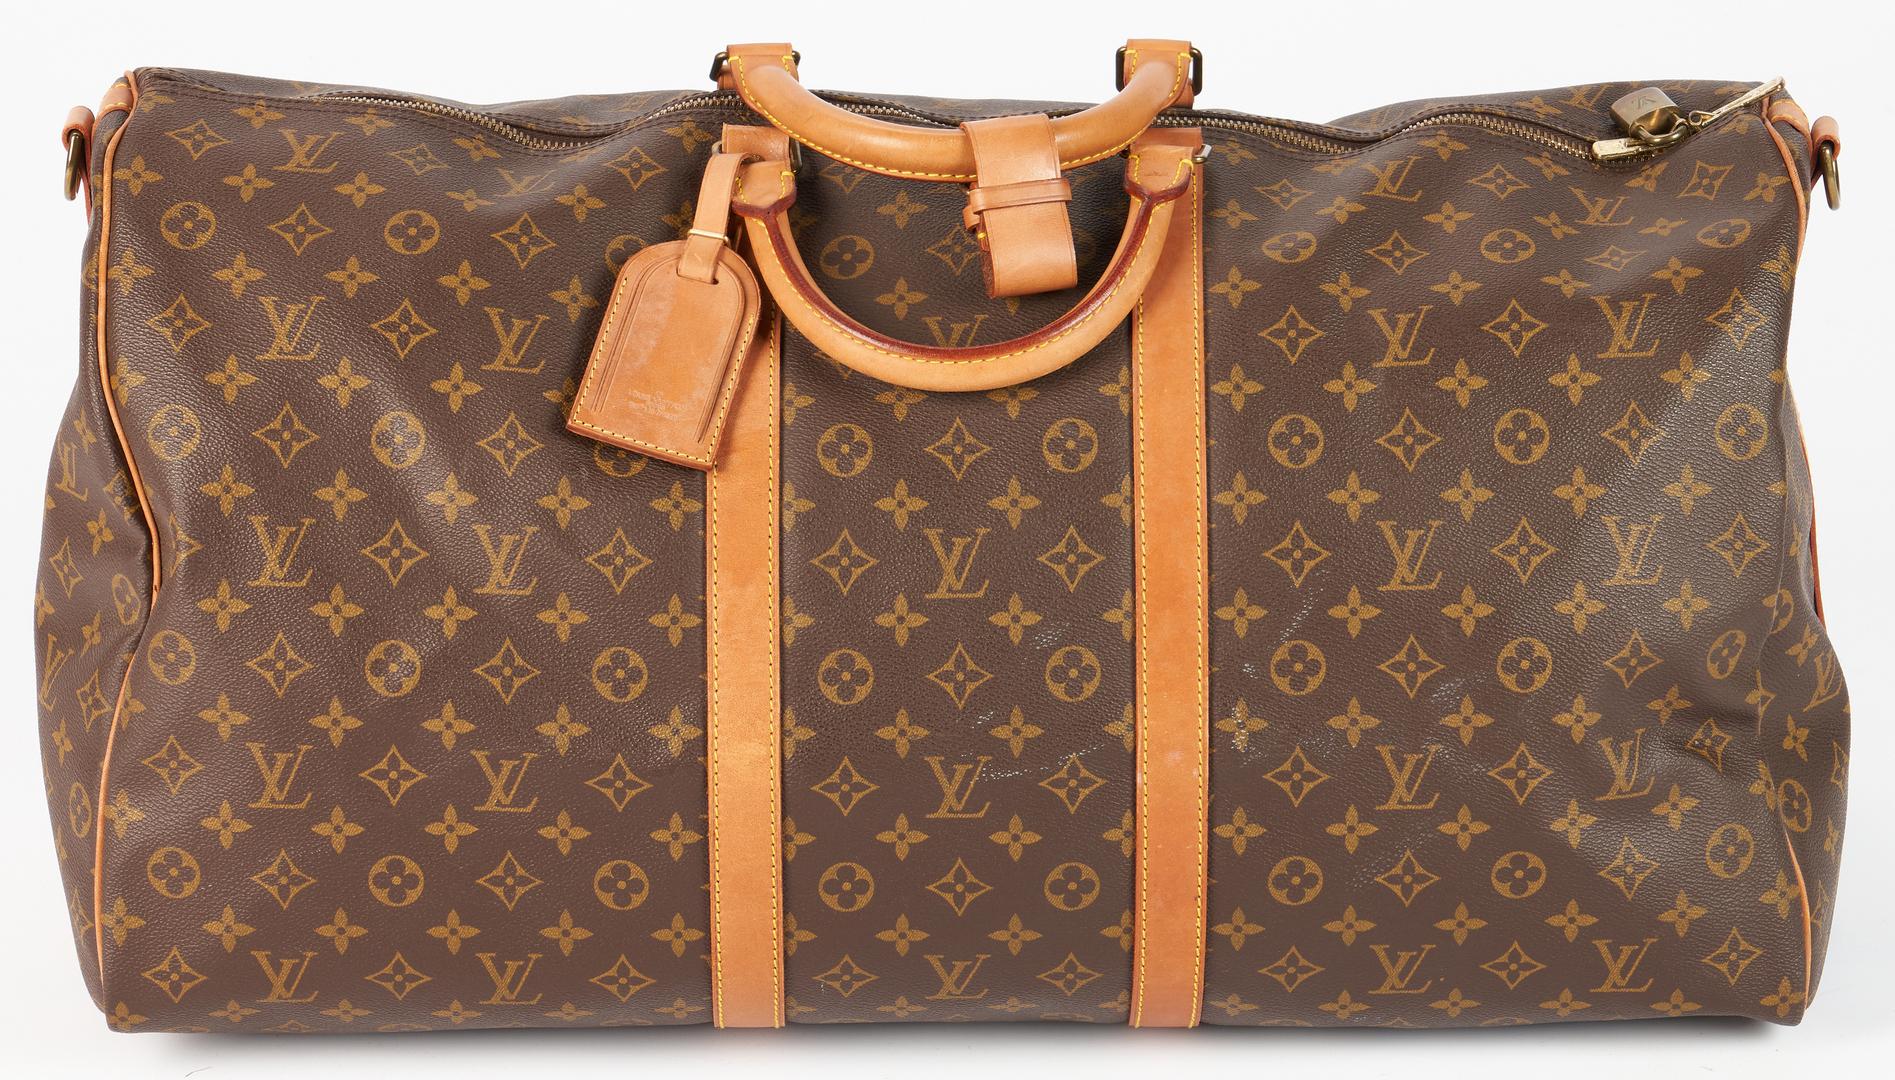 Lot 708: Louis Vuitton Keepall Duffle Bag